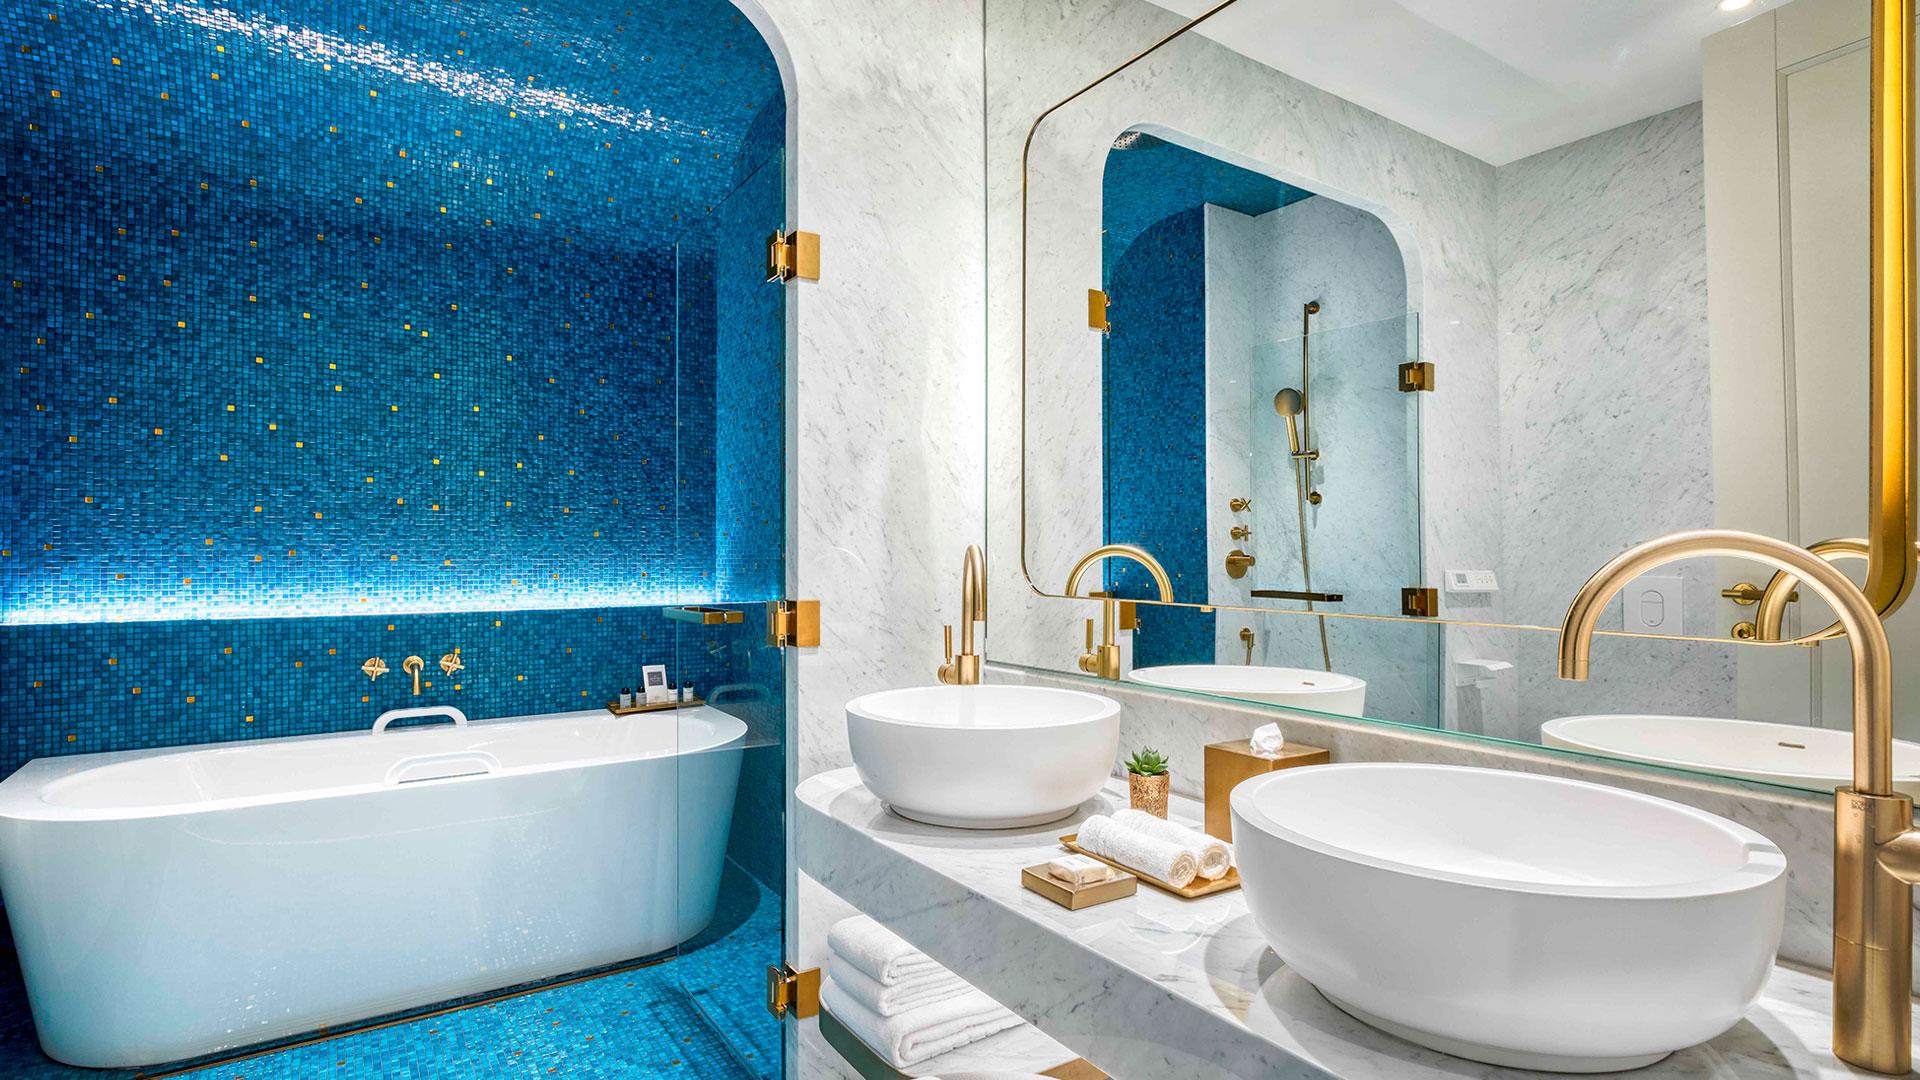 Imagen del hotel Matild Palace